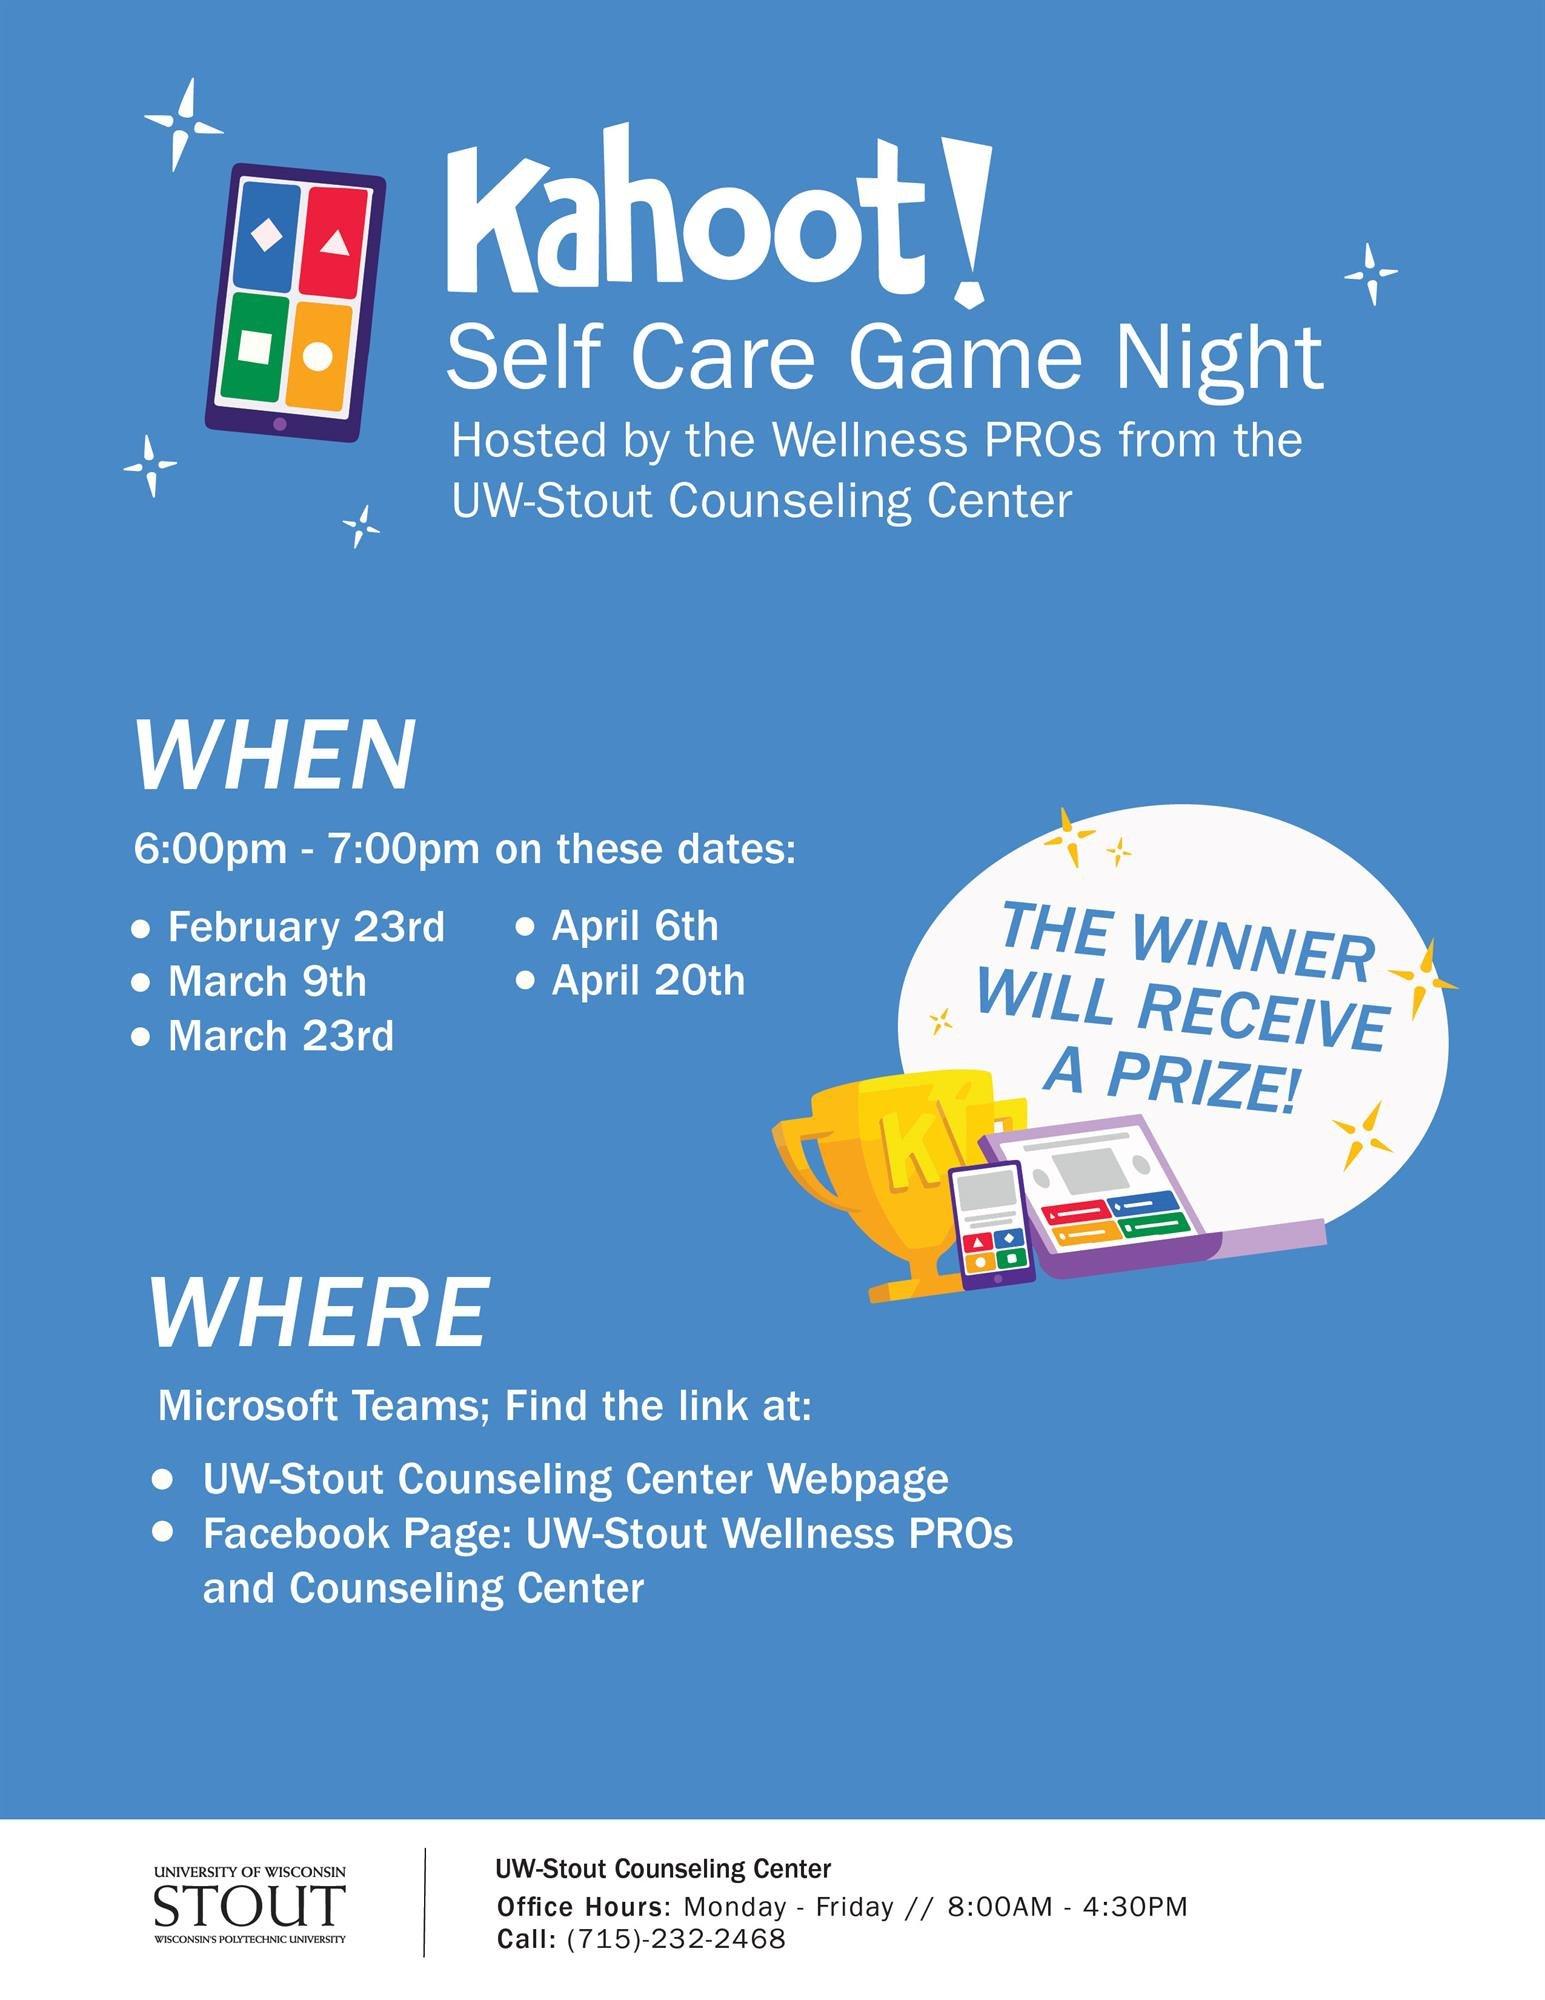 Kahoot! Self Care Game Night